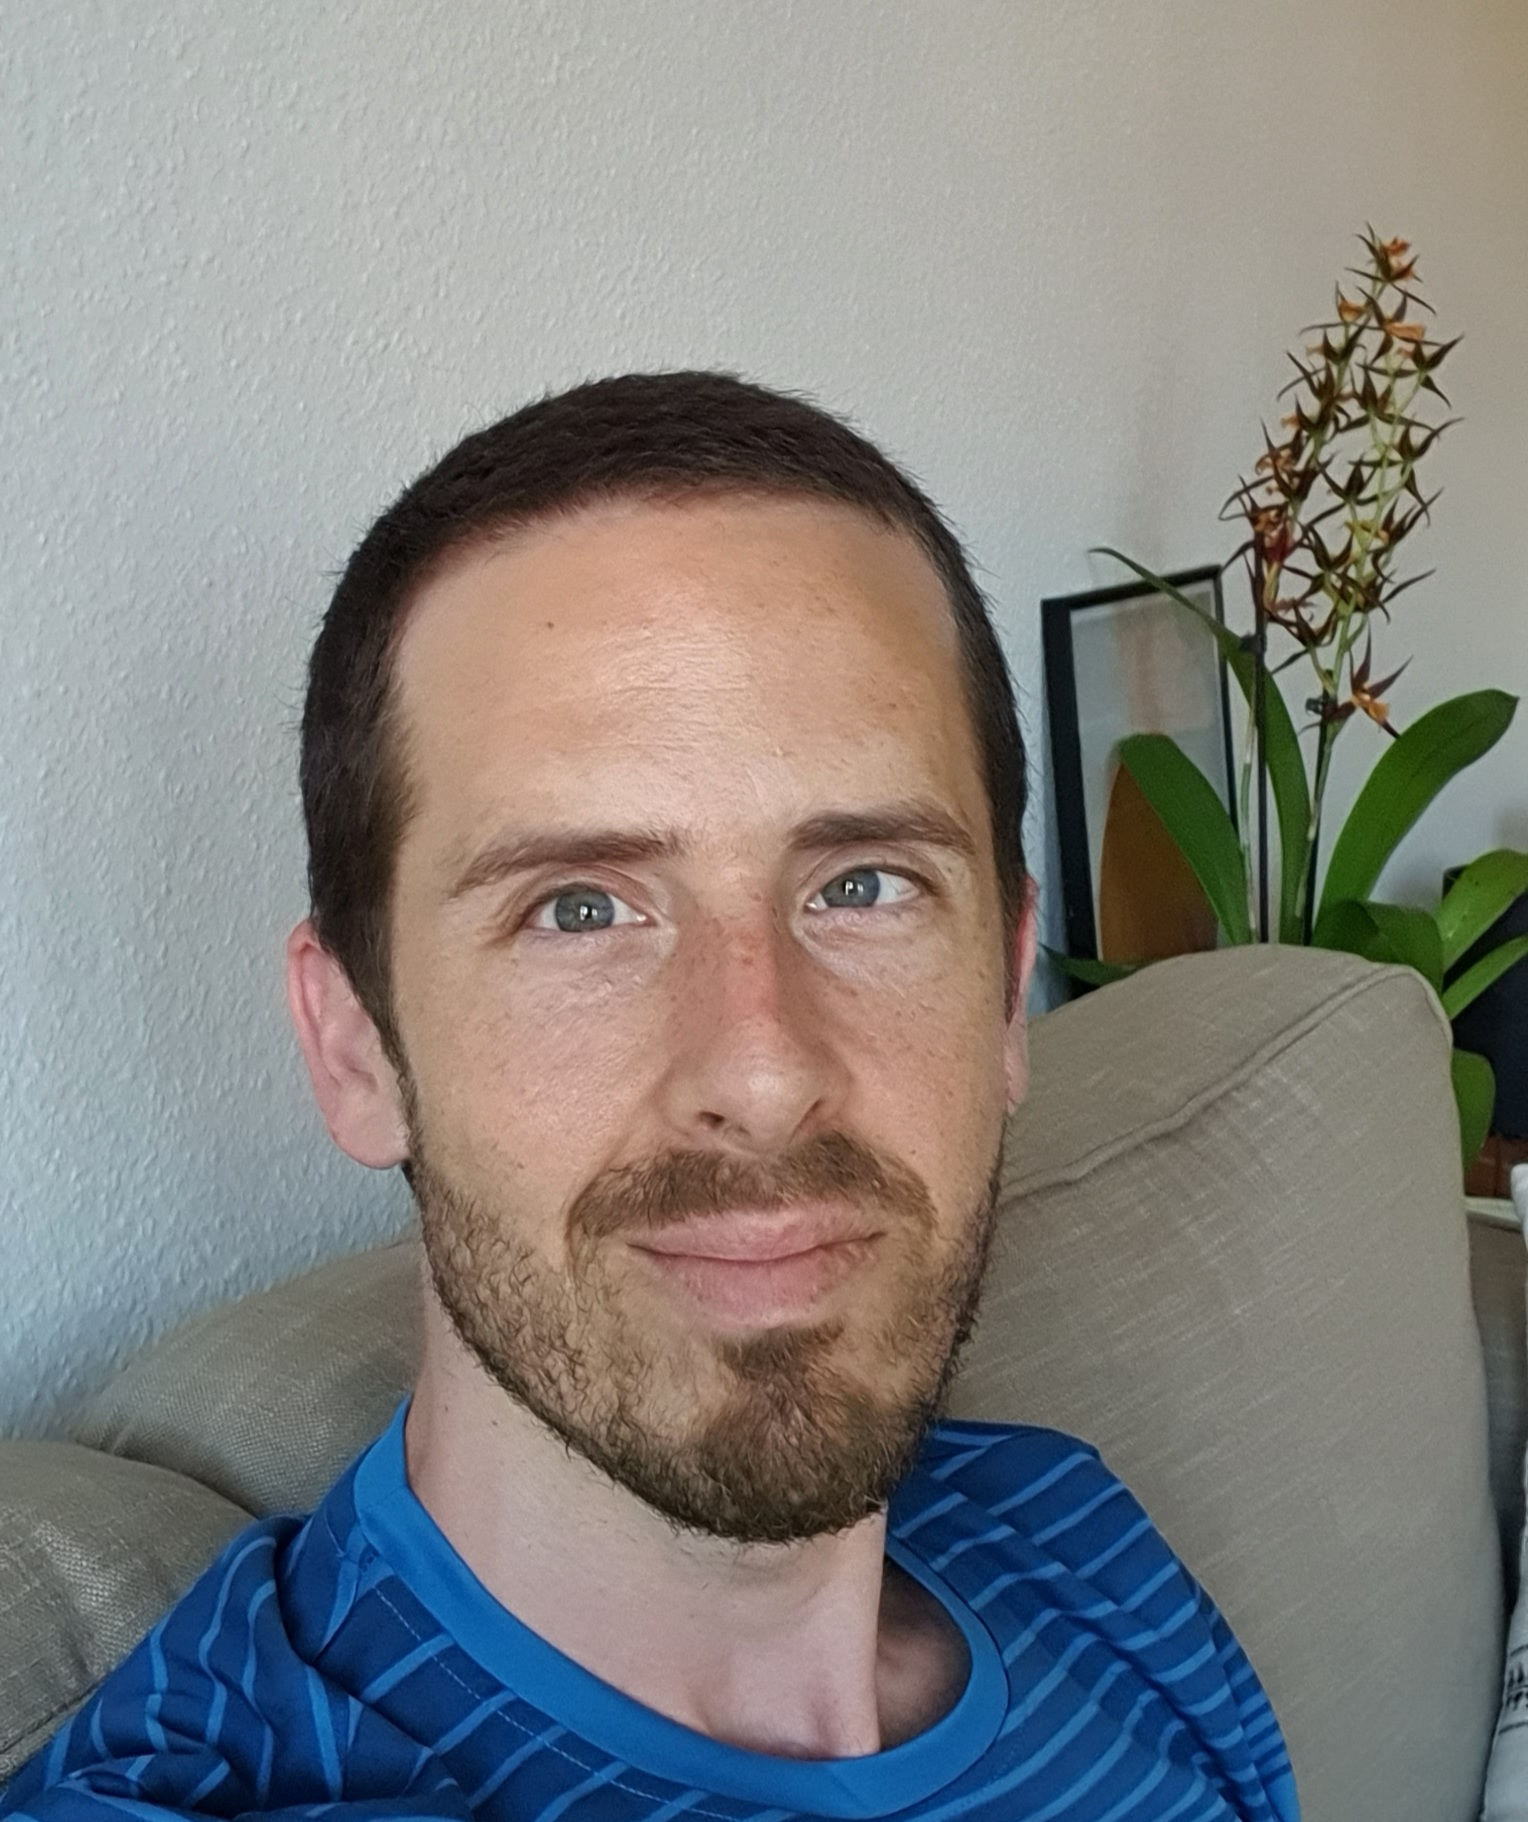 Avatar of Tom Eckert